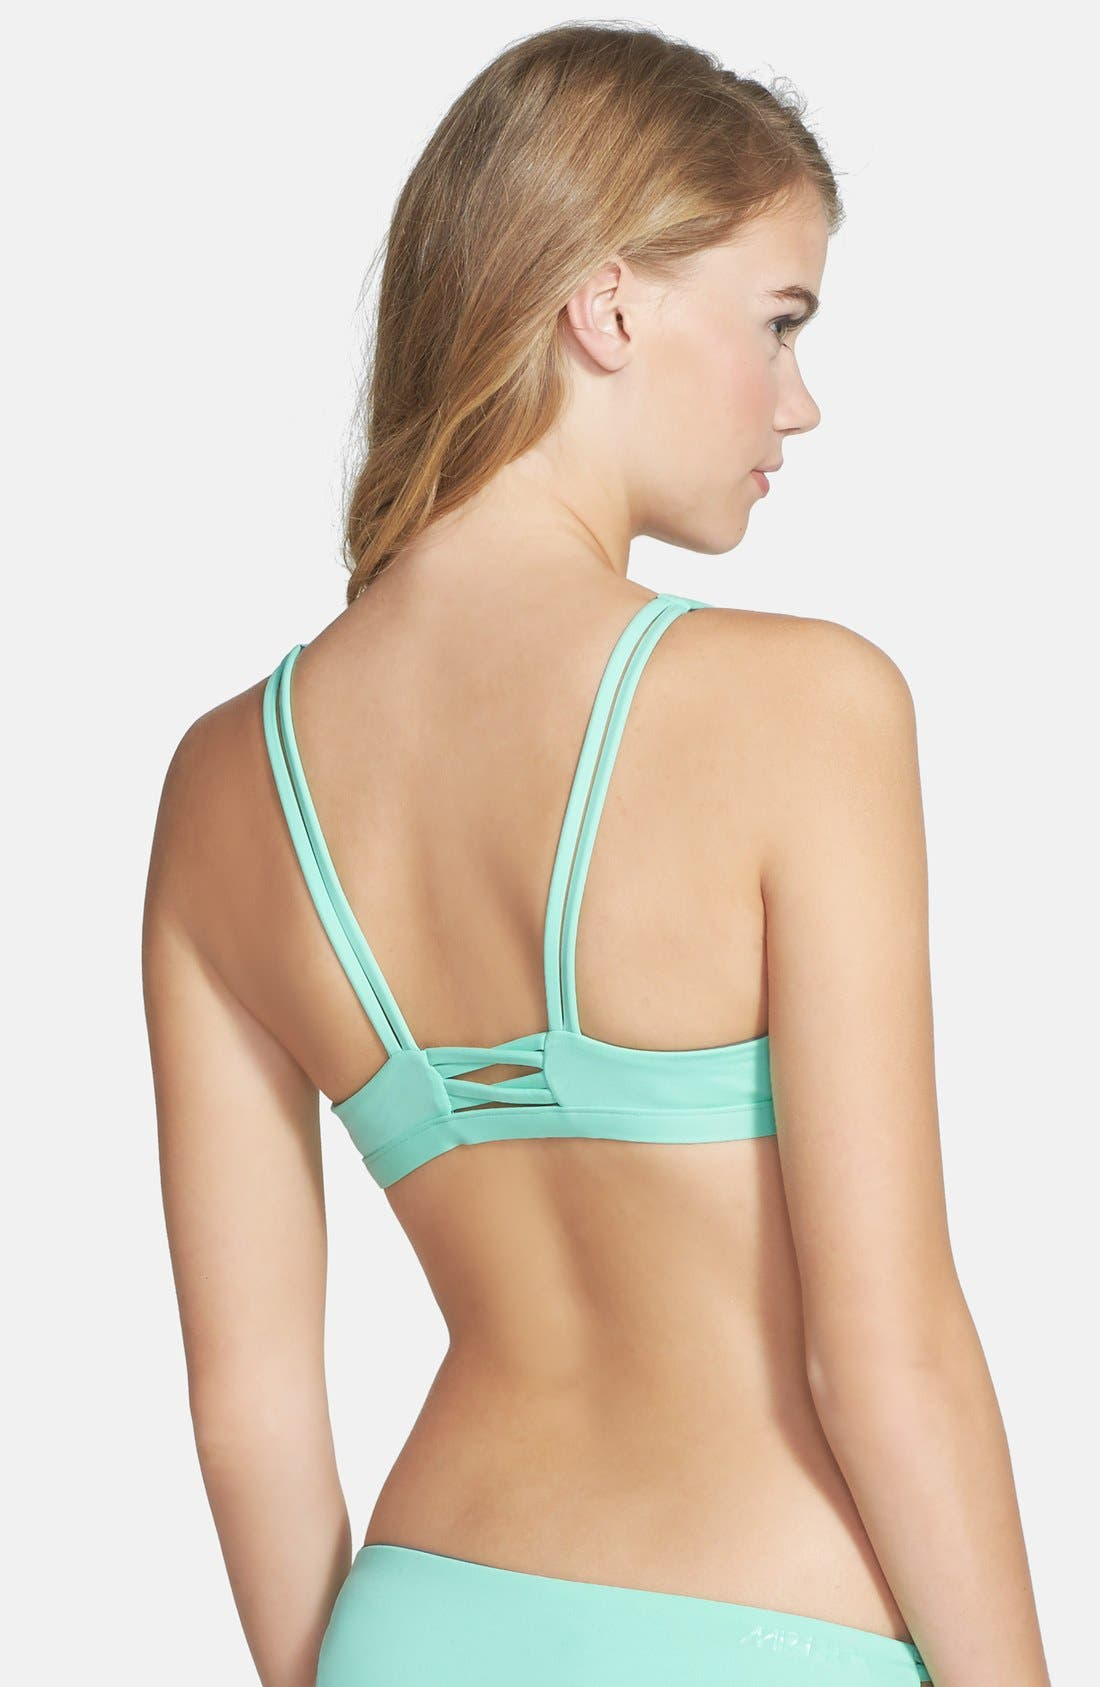 RIP CURL, 'Mirage' Reversible Bikini Top, Alternate thumbnail 6, color, 300